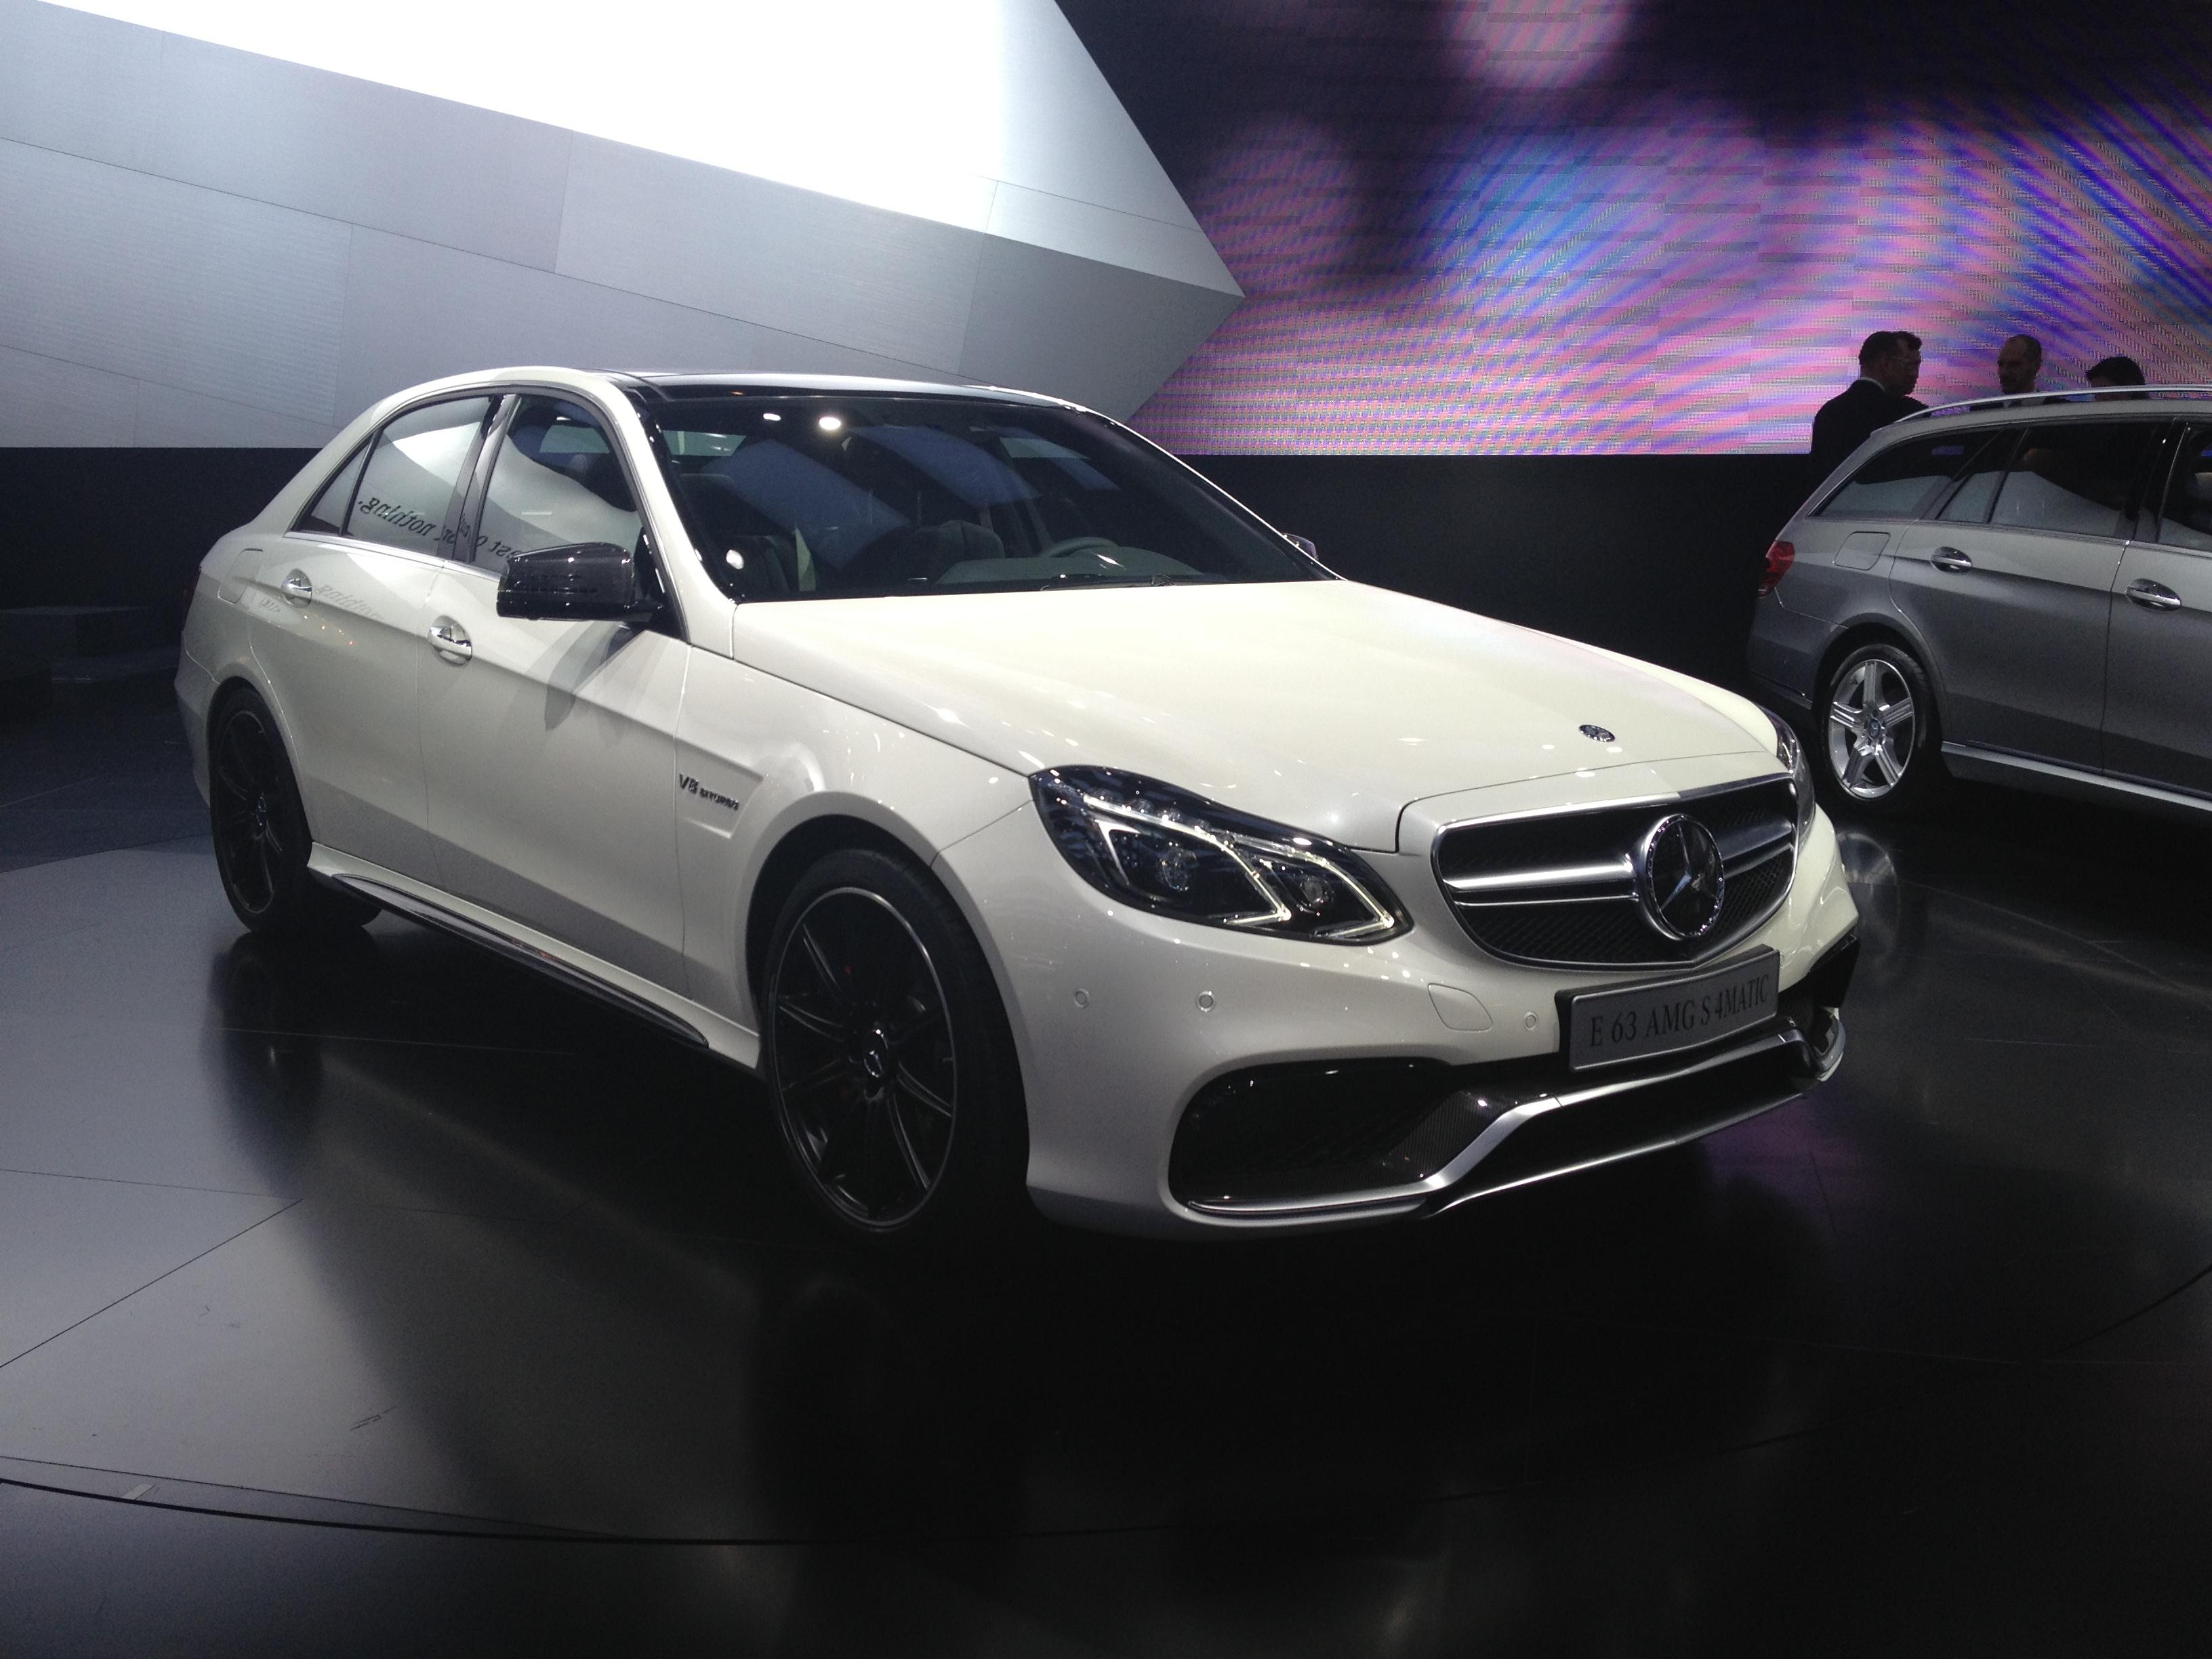 Datei 2014 mercedes benz e63 amg s 4matic 8404447380 jpg for Mercedes benz e63 amg s 4matic